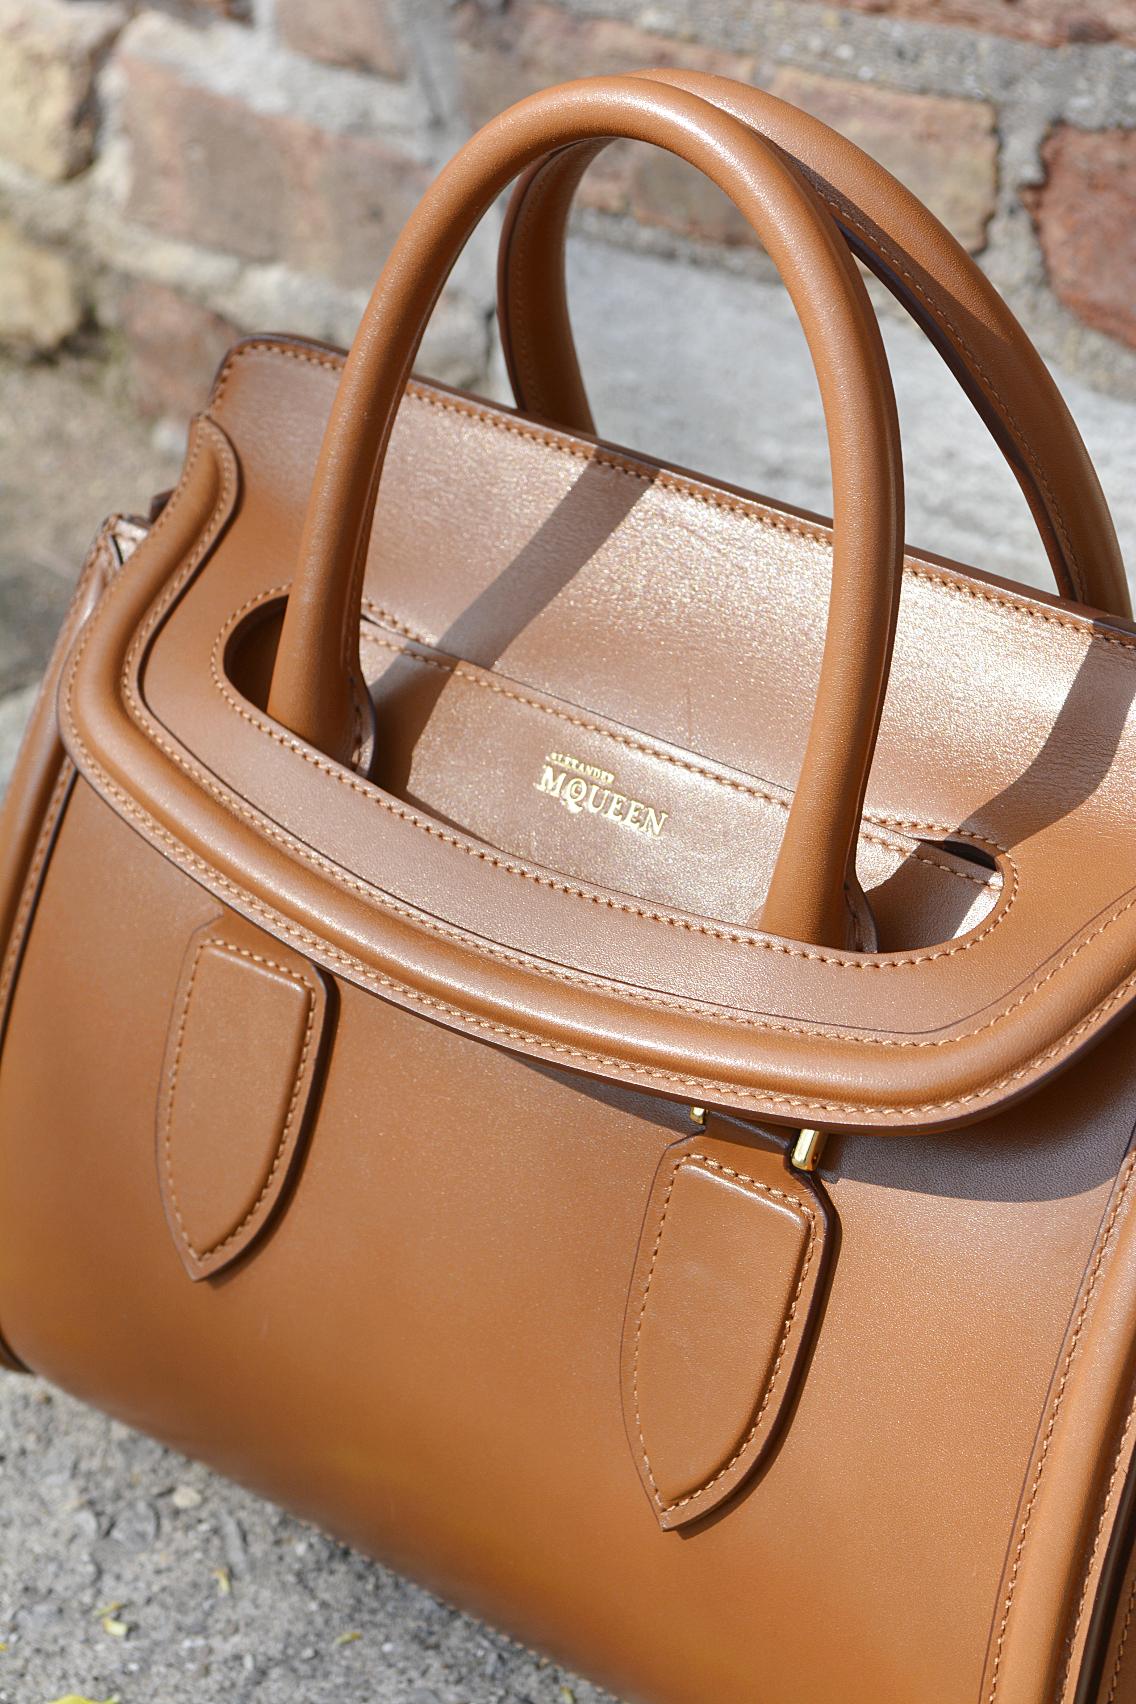 Alexander McQueen Small Heroine Bag Purse in Burnt Camel 7